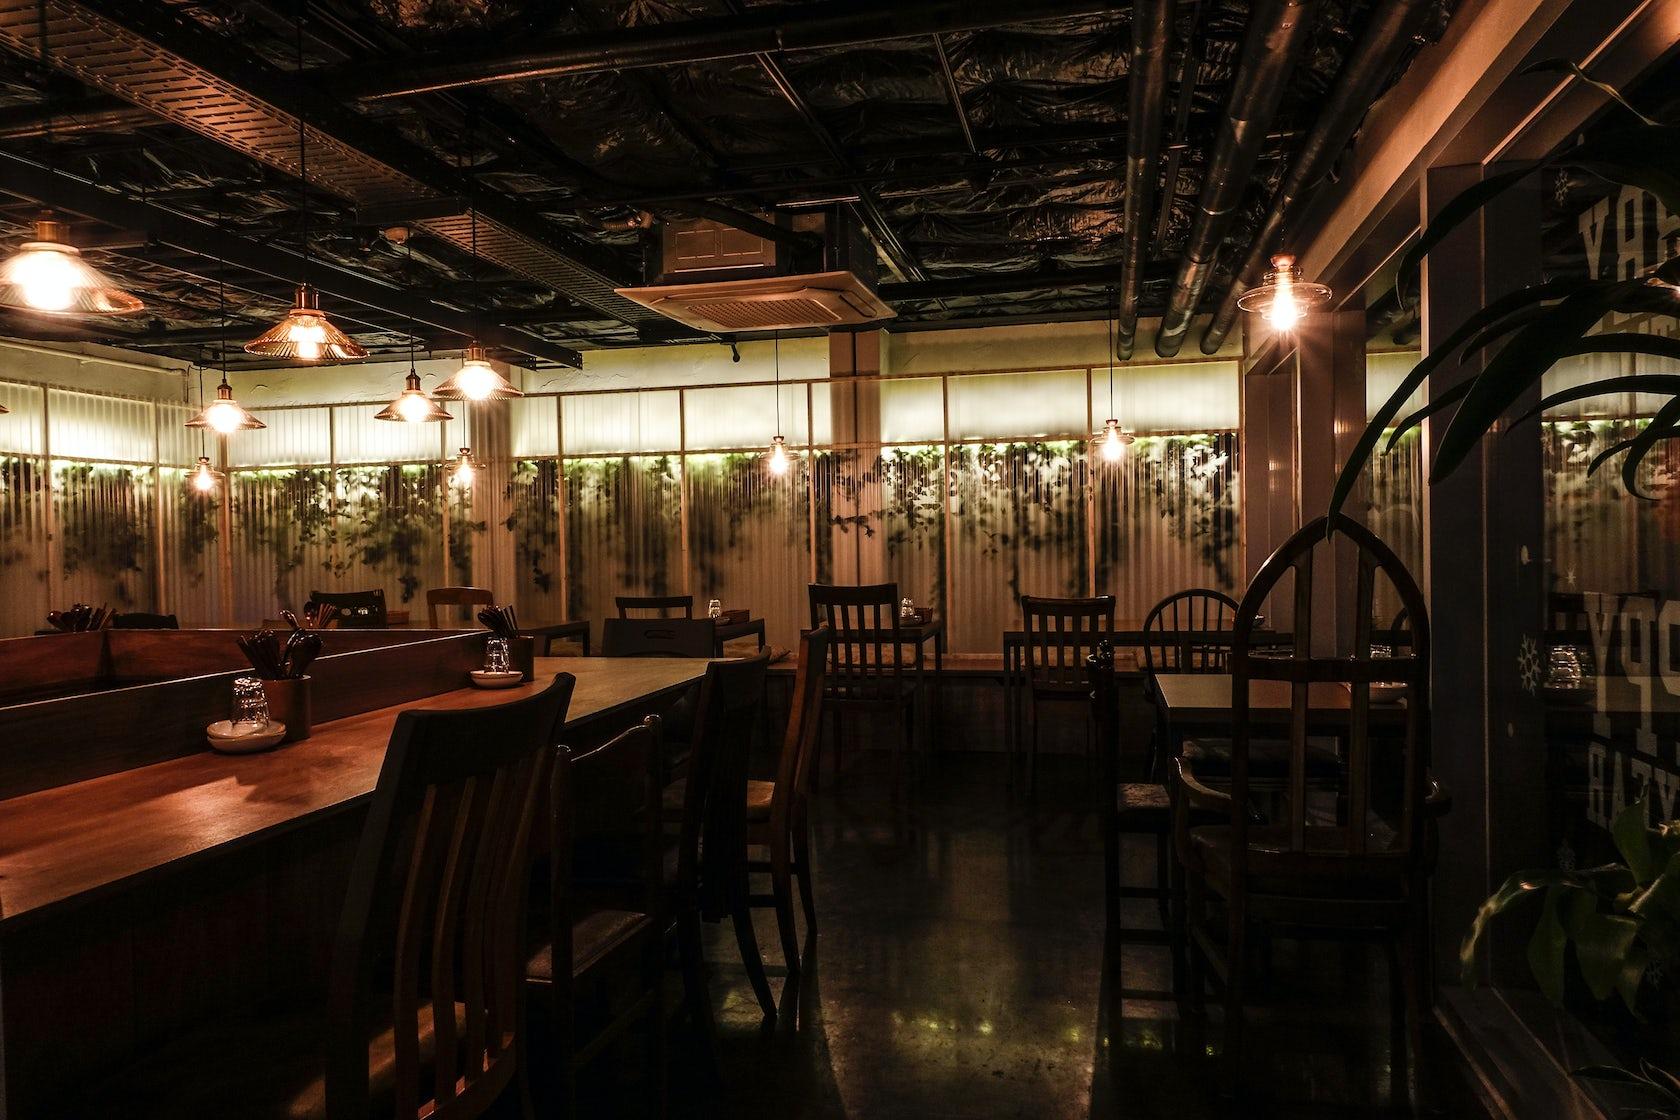 Late night restaurant interior design in seoul architizer